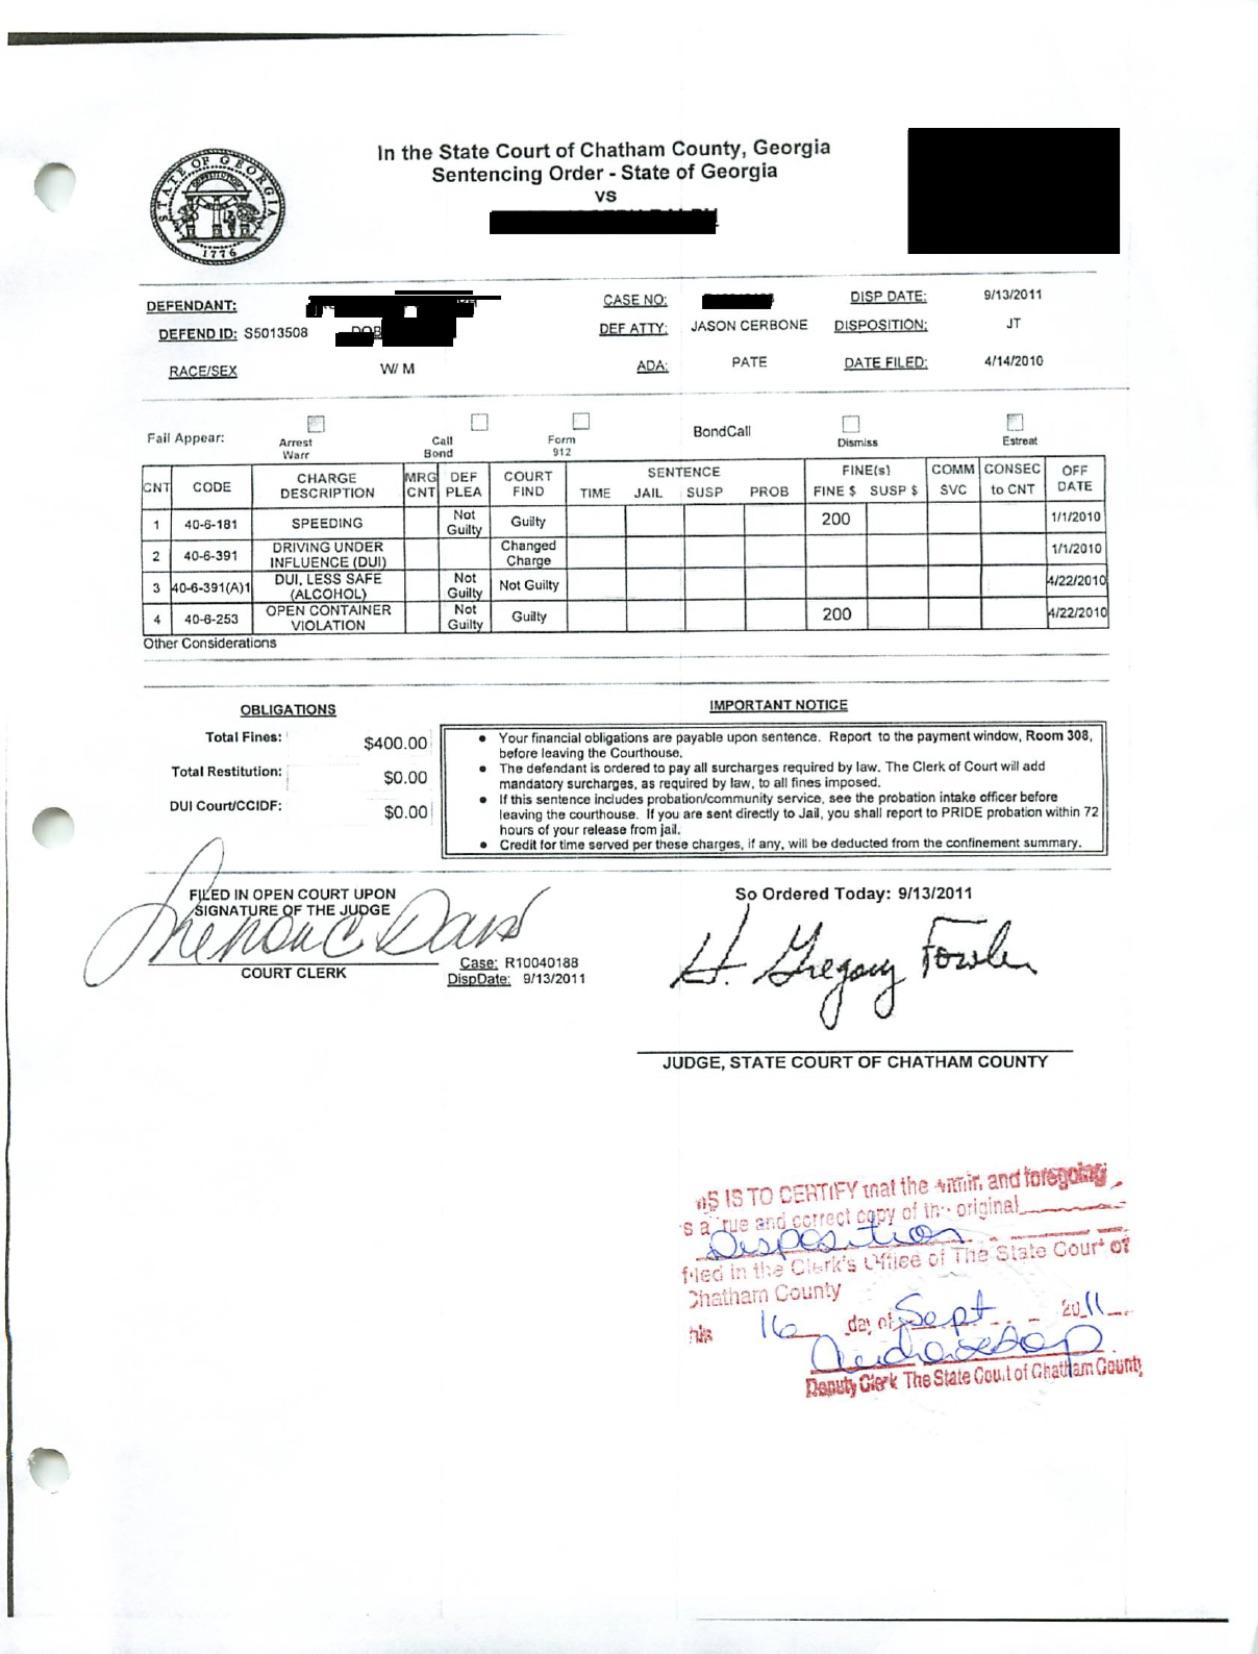 DUI jury trial win